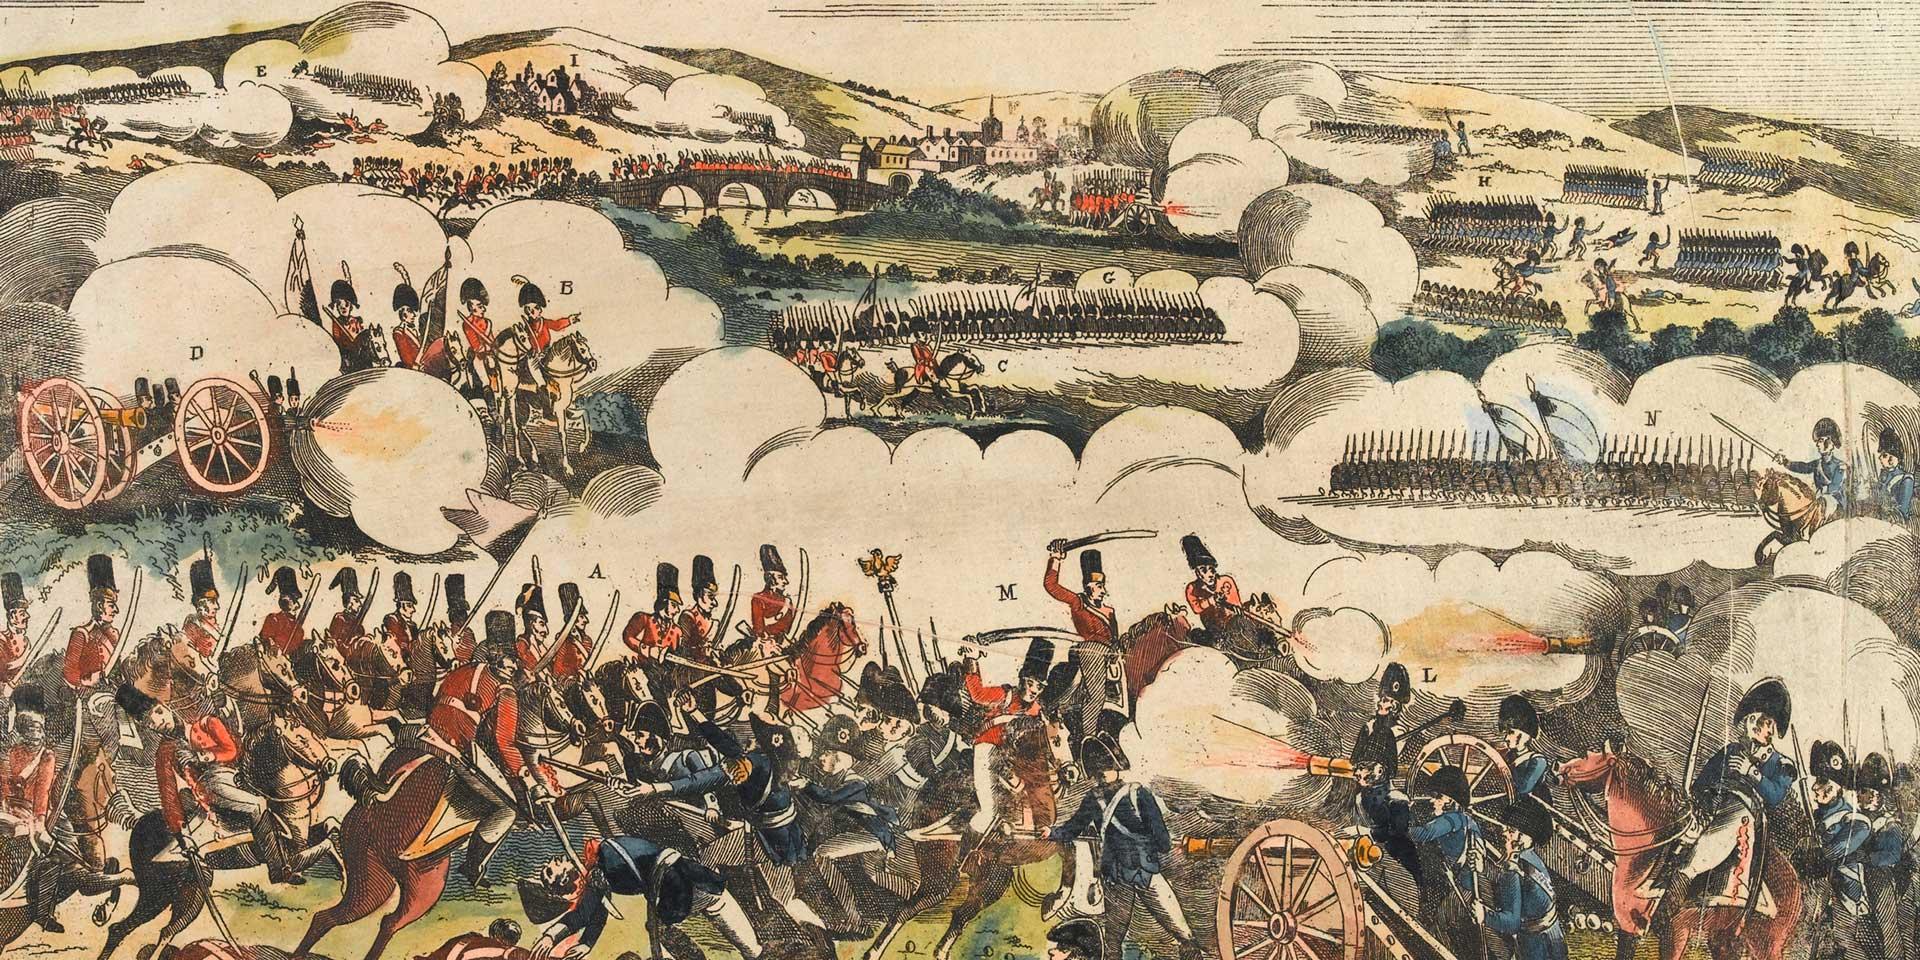 Battle of Salamanca, 1812